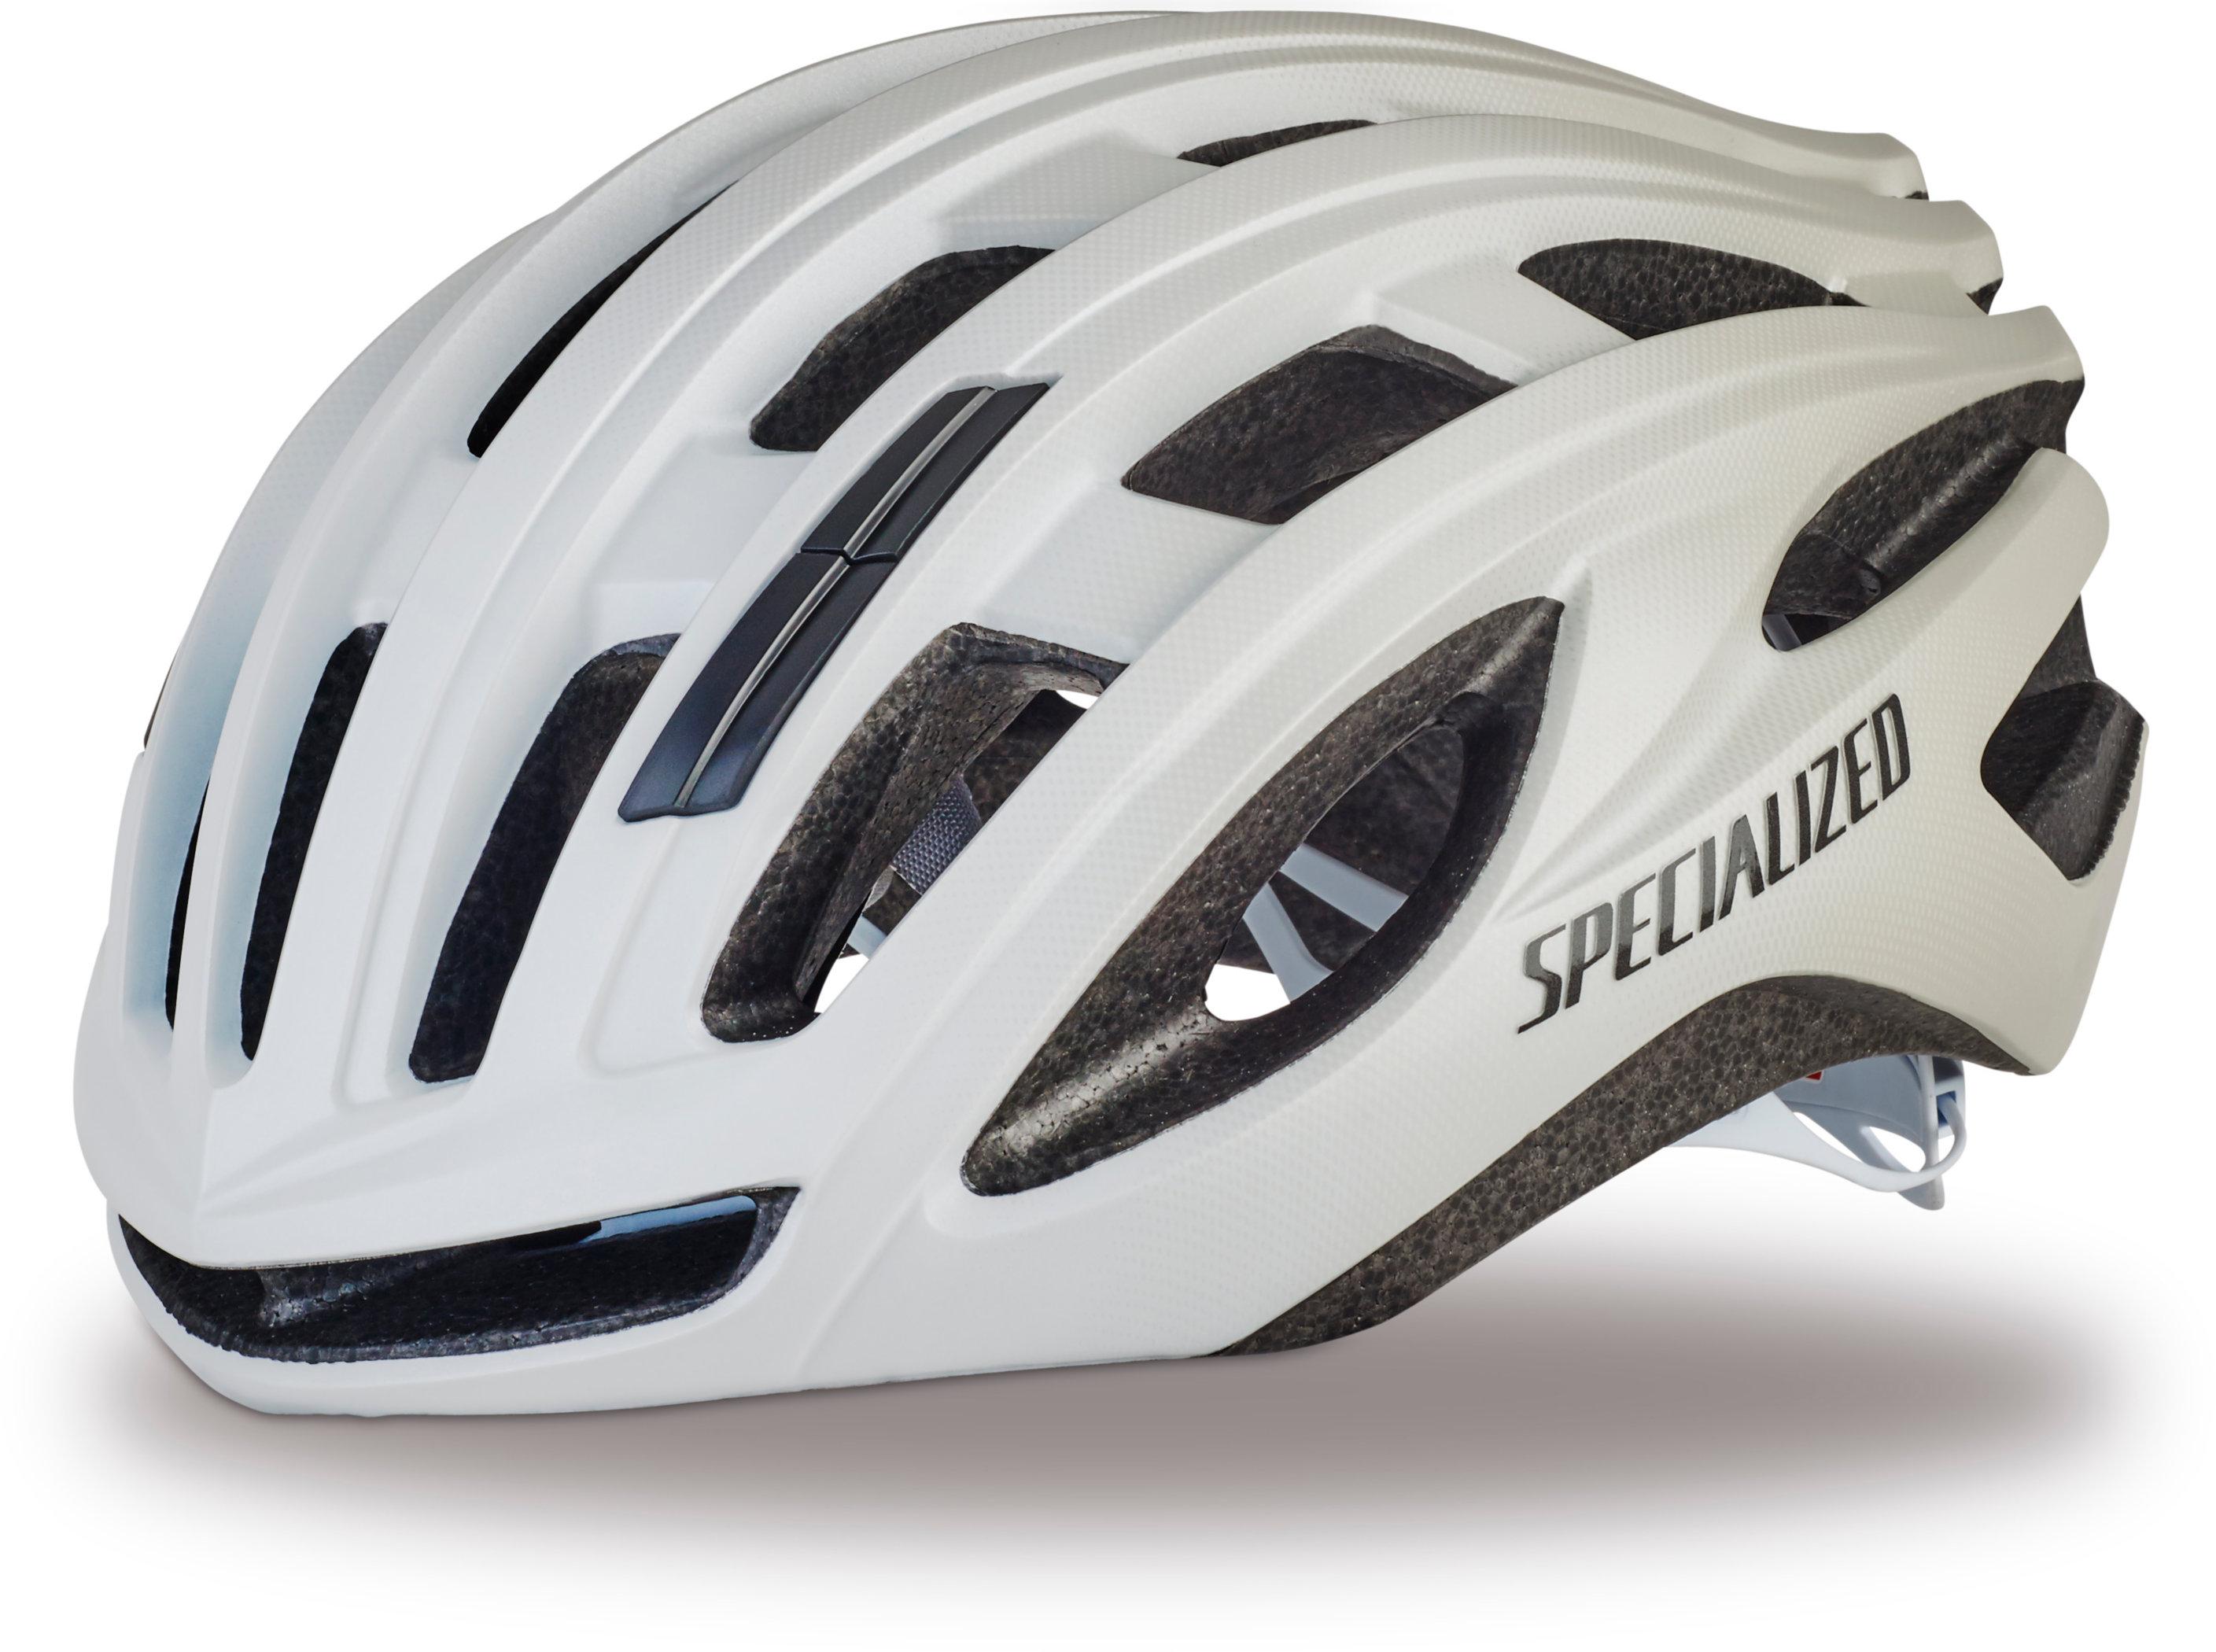 SPECIALIZED PROPERO 3 HLMT CE WMN WHT L - Alpha Bikes